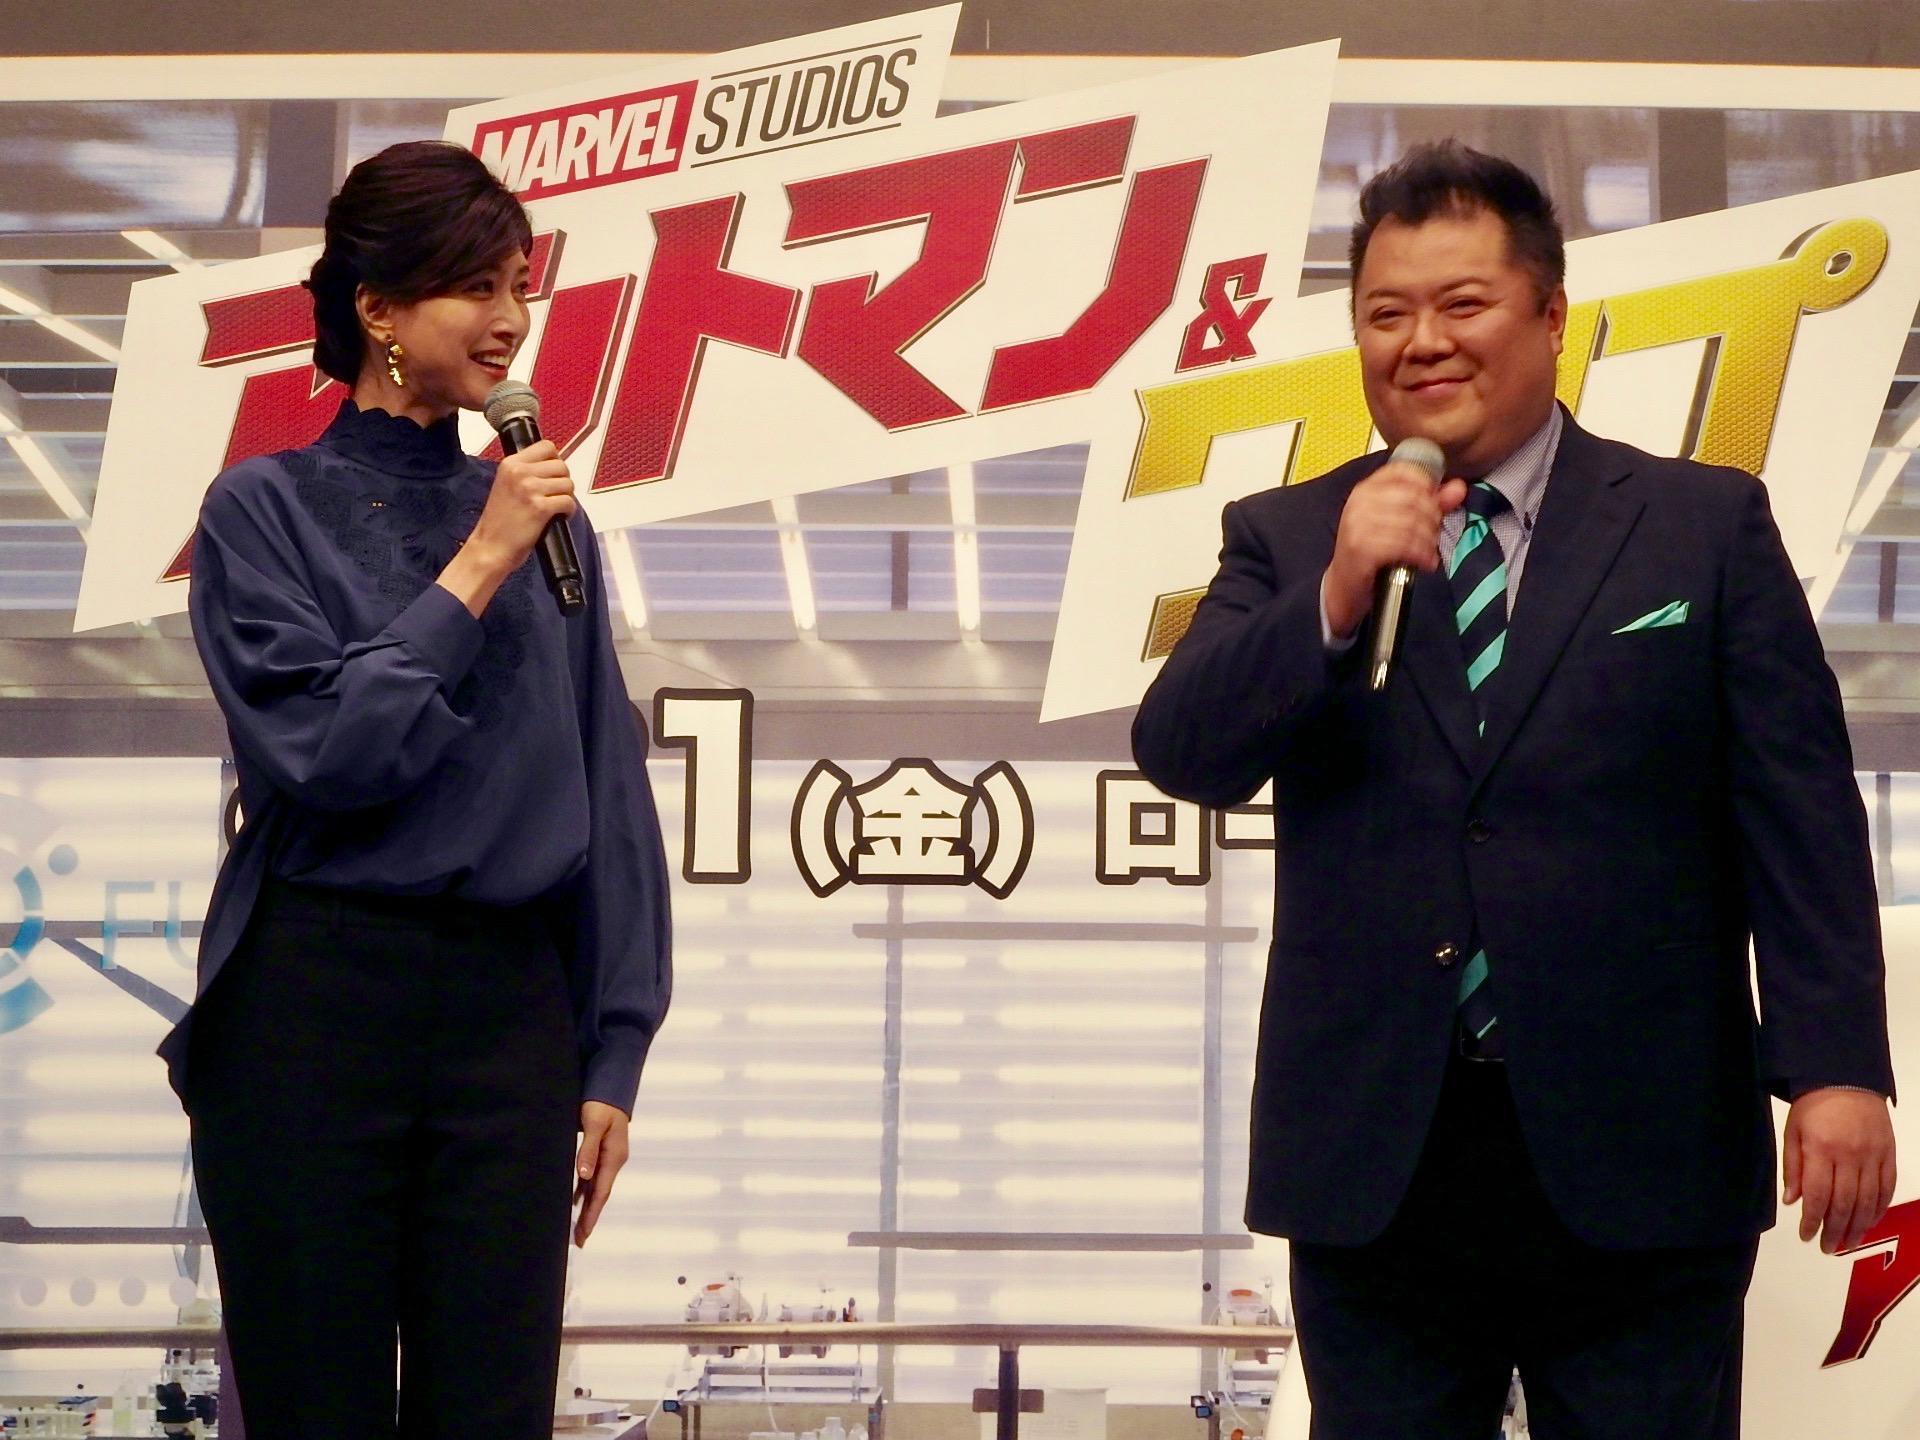 http://news.yoshimoto.co.jp/20180708154353-a93cda3b2ea6528e69903b350aacd66e4948434a.jpg